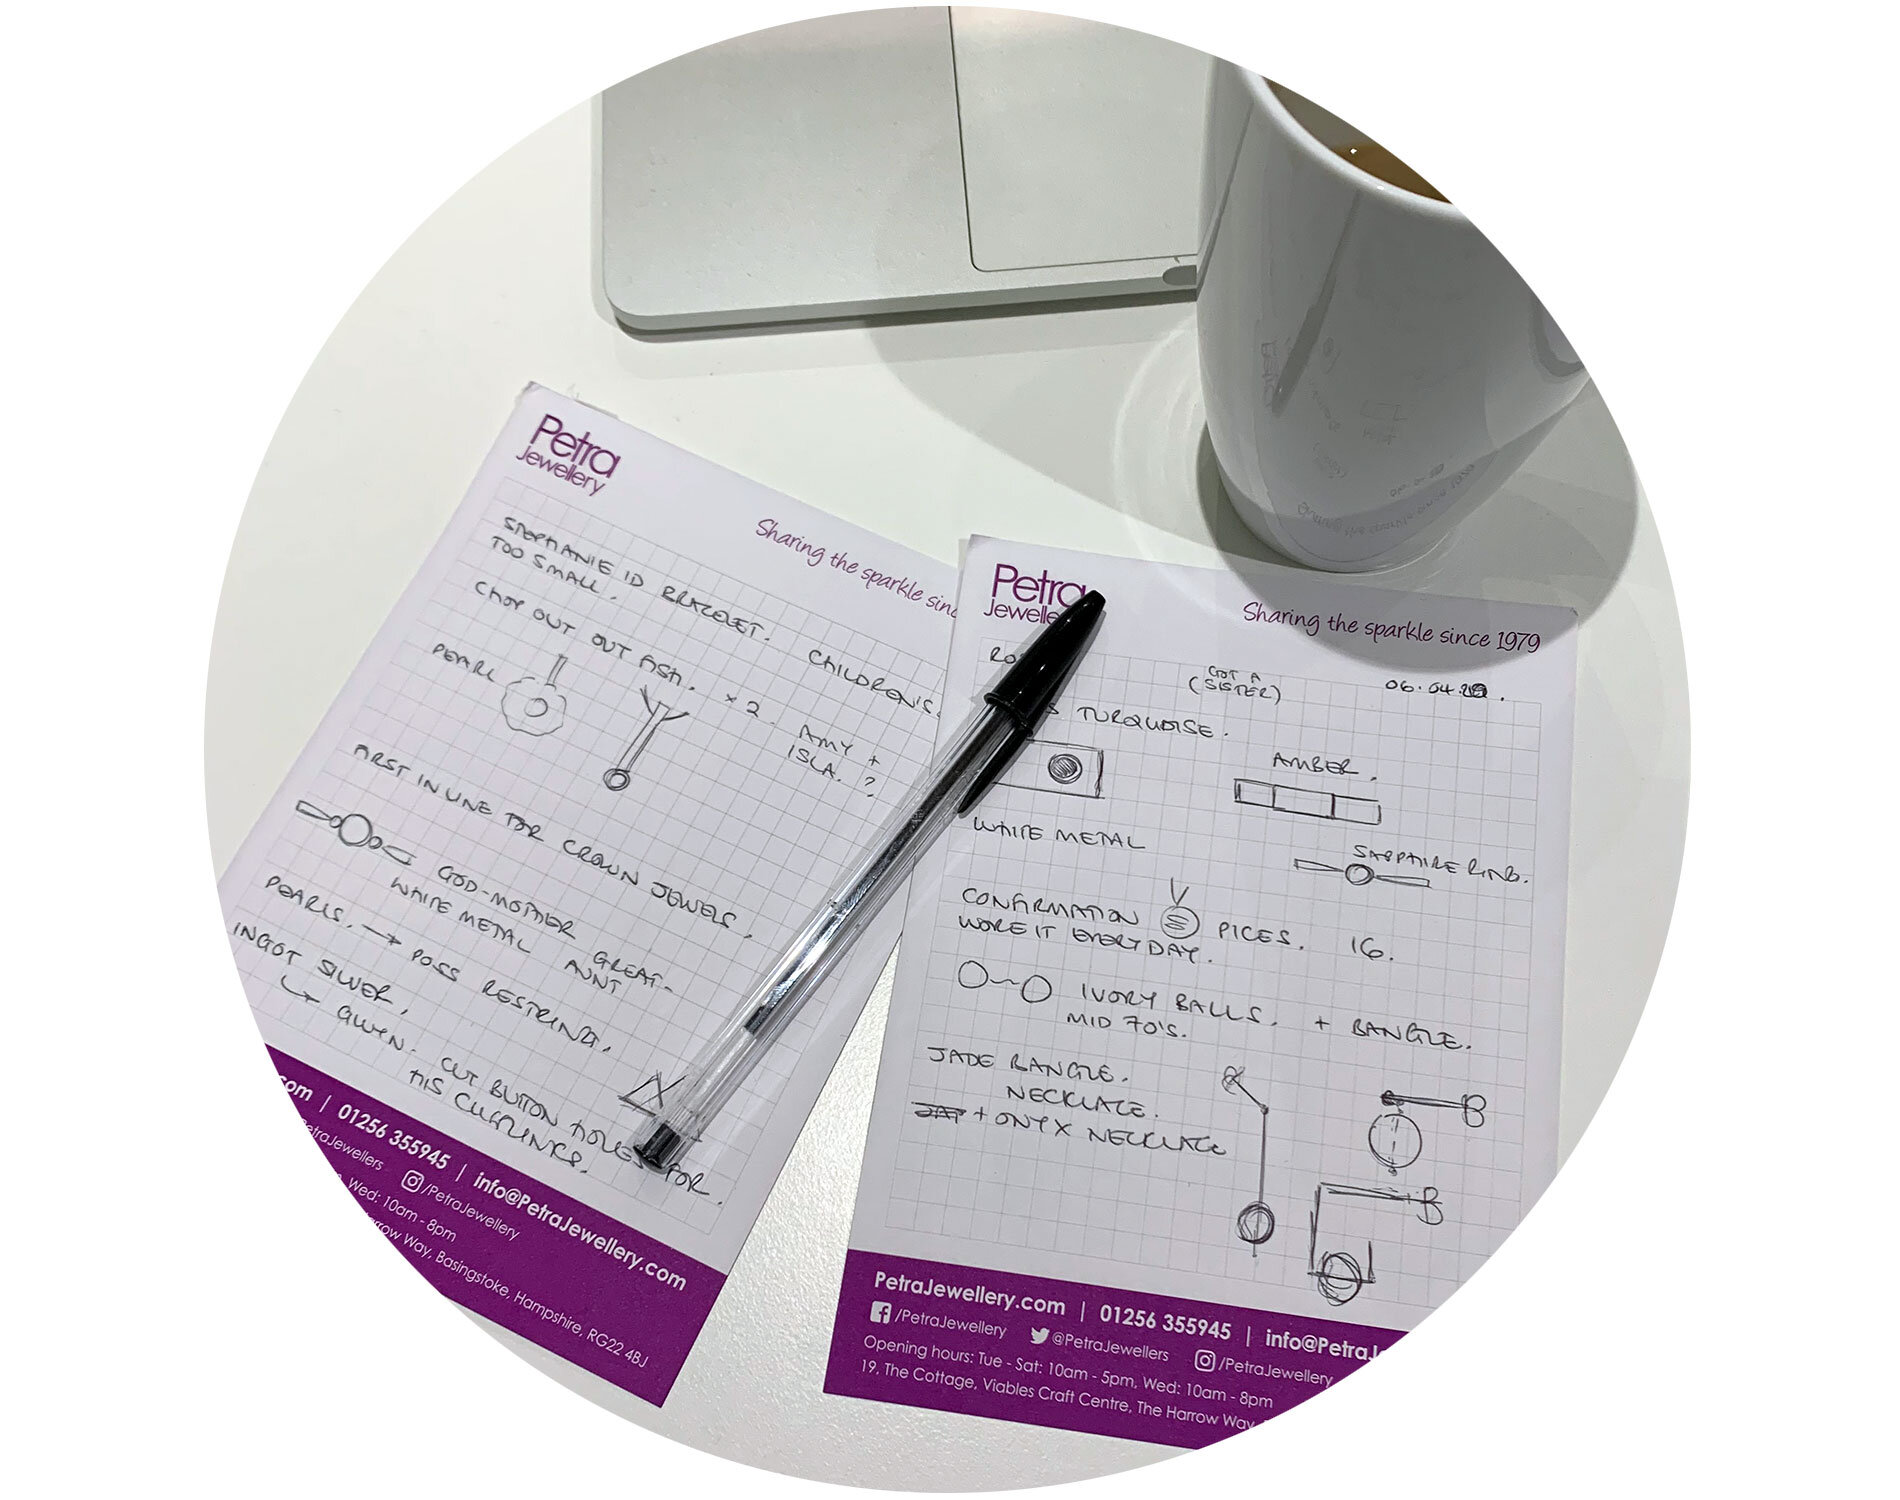 Design-notes.jpg